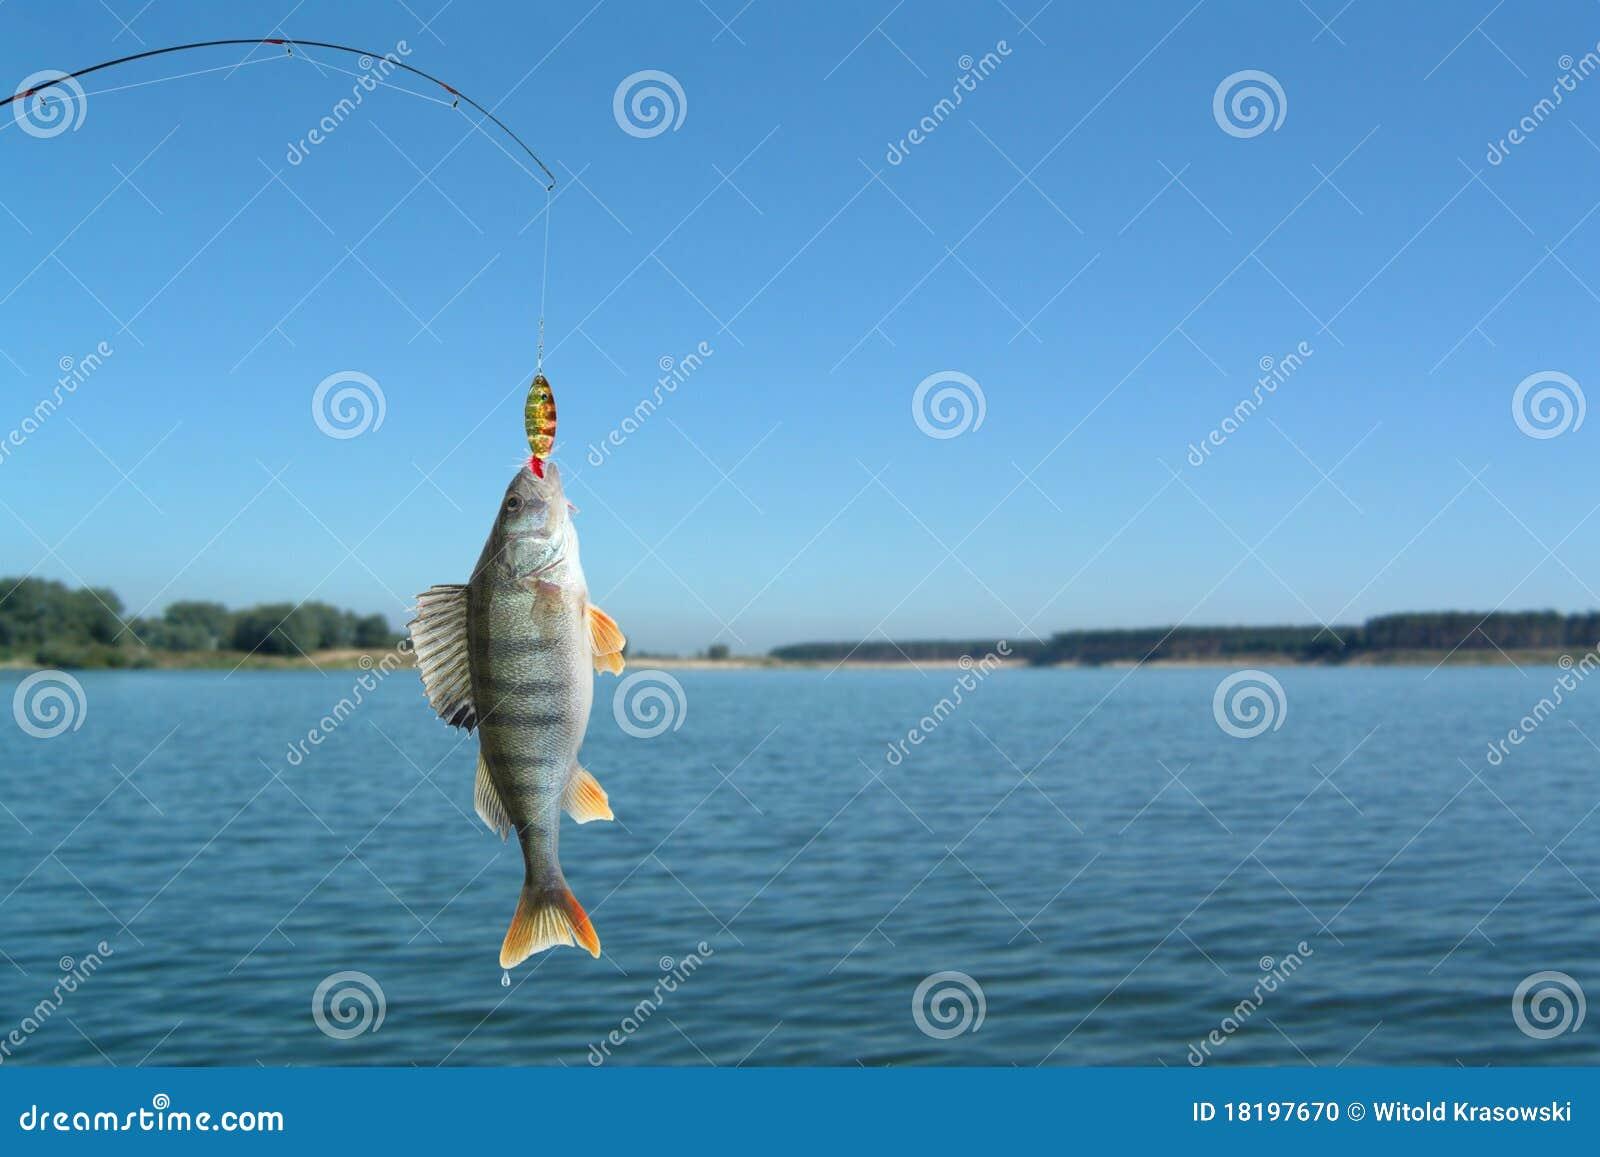 Perch on fishing-rod